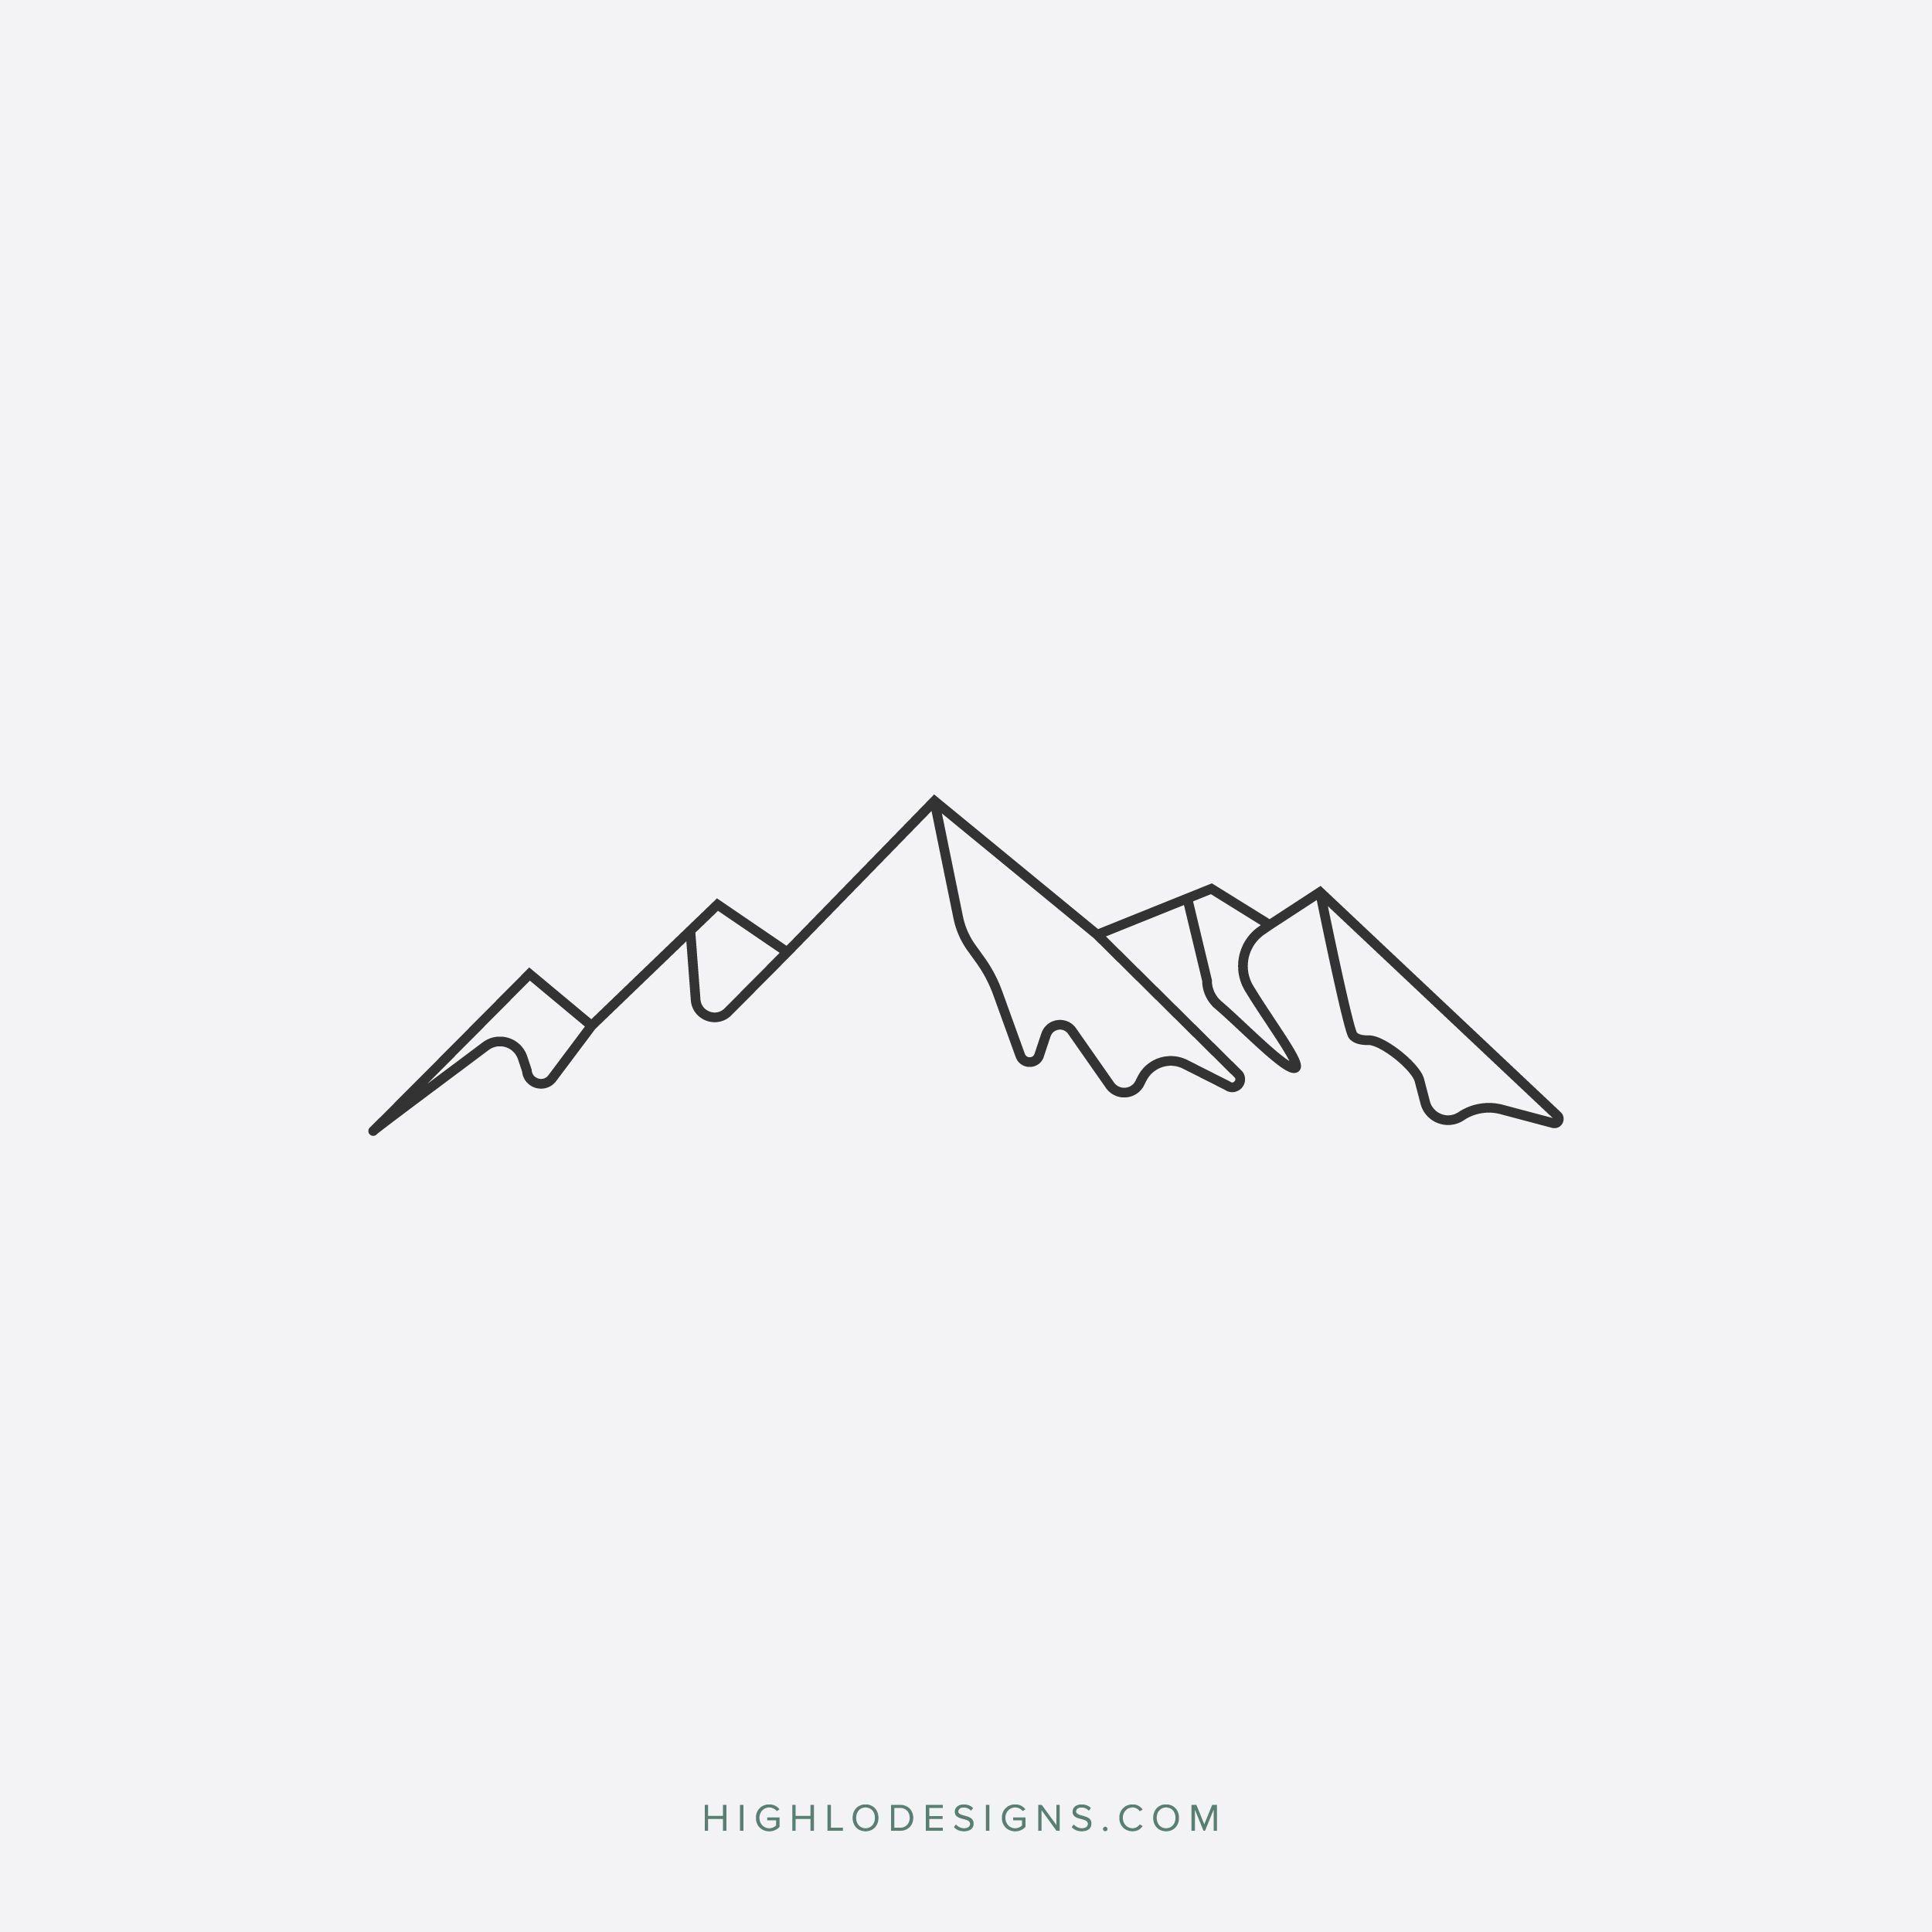 Outline Minimalist Outline Simple Mountain Tattoo - Best ...